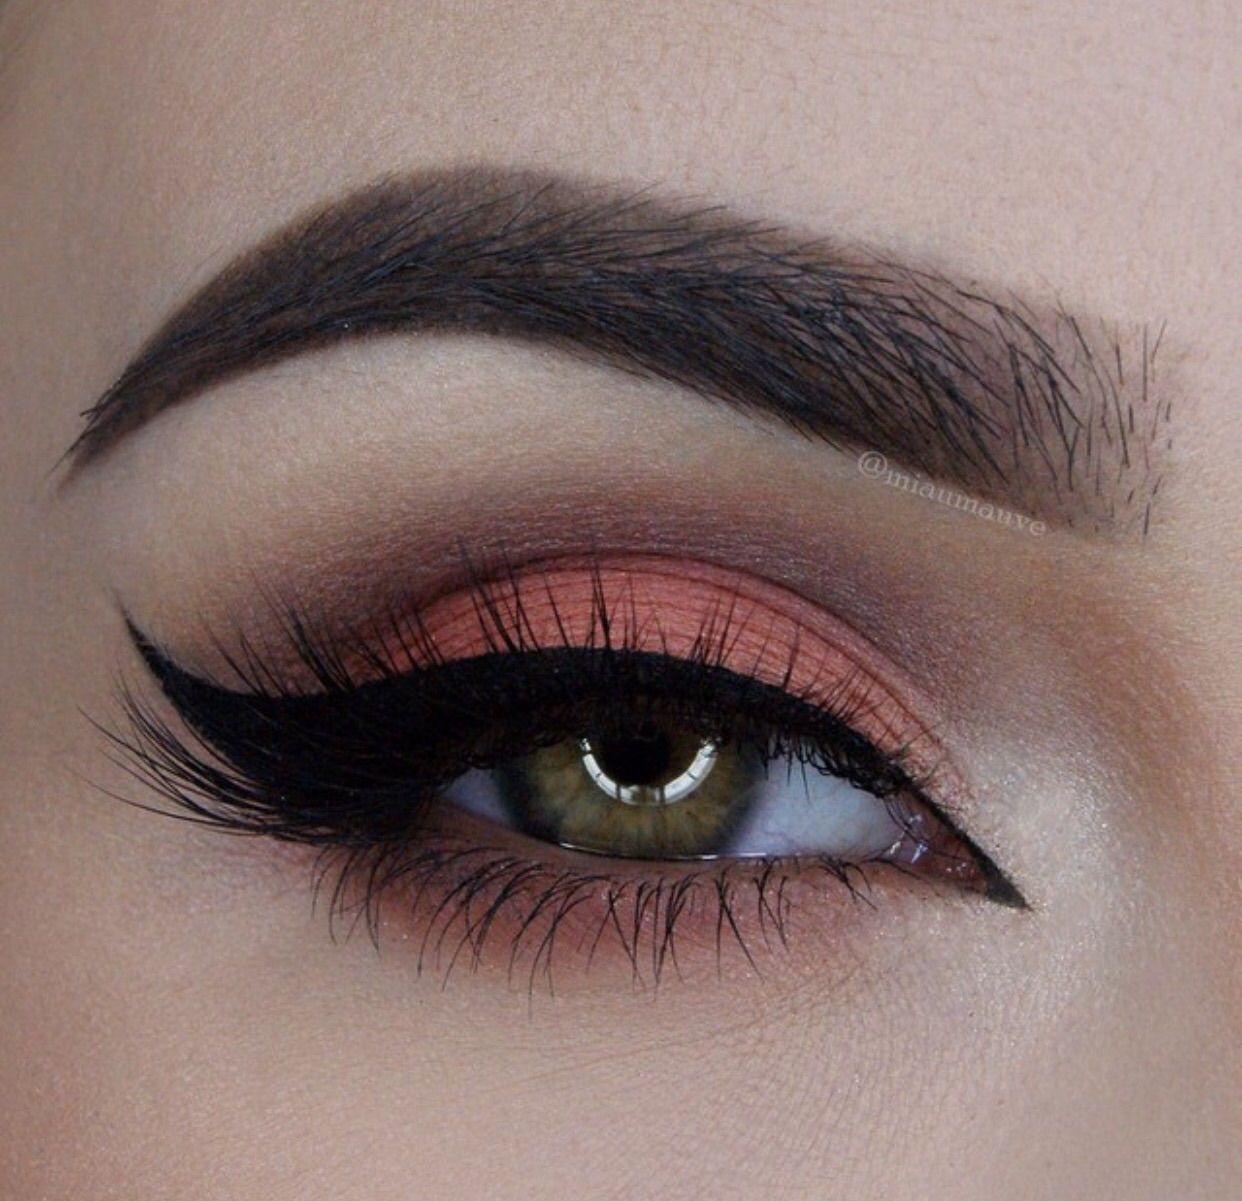 pingl par marisa asiram sur eye makeup pinterest maquillage maquillage yeux et id e. Black Bedroom Furniture Sets. Home Design Ideas